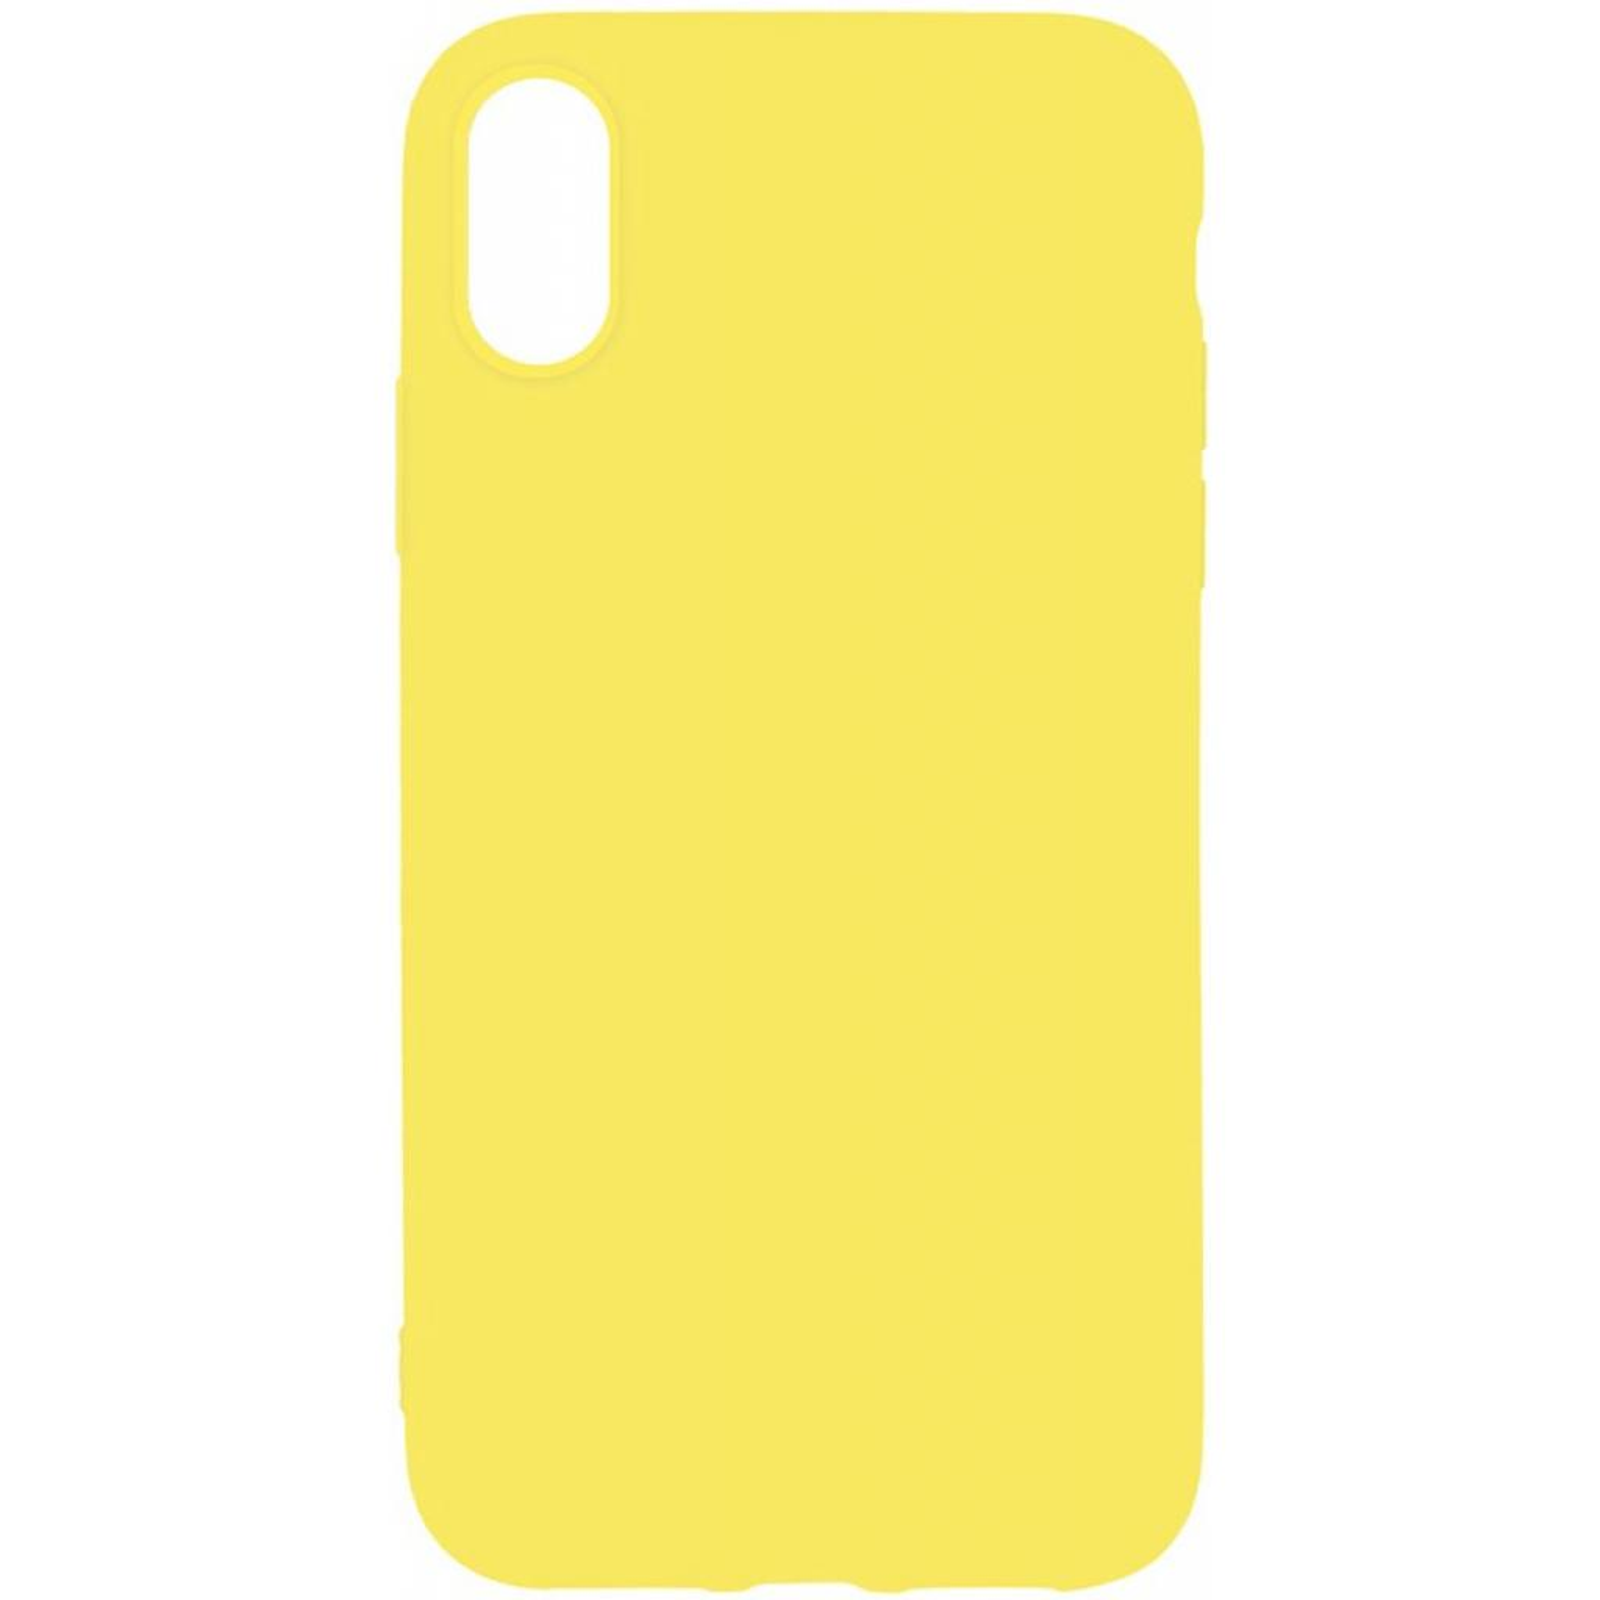 Чехол для моб. телефона Toto 1mm Matt TPU Case Apple iPhone XS Max Yellow (F_93848)